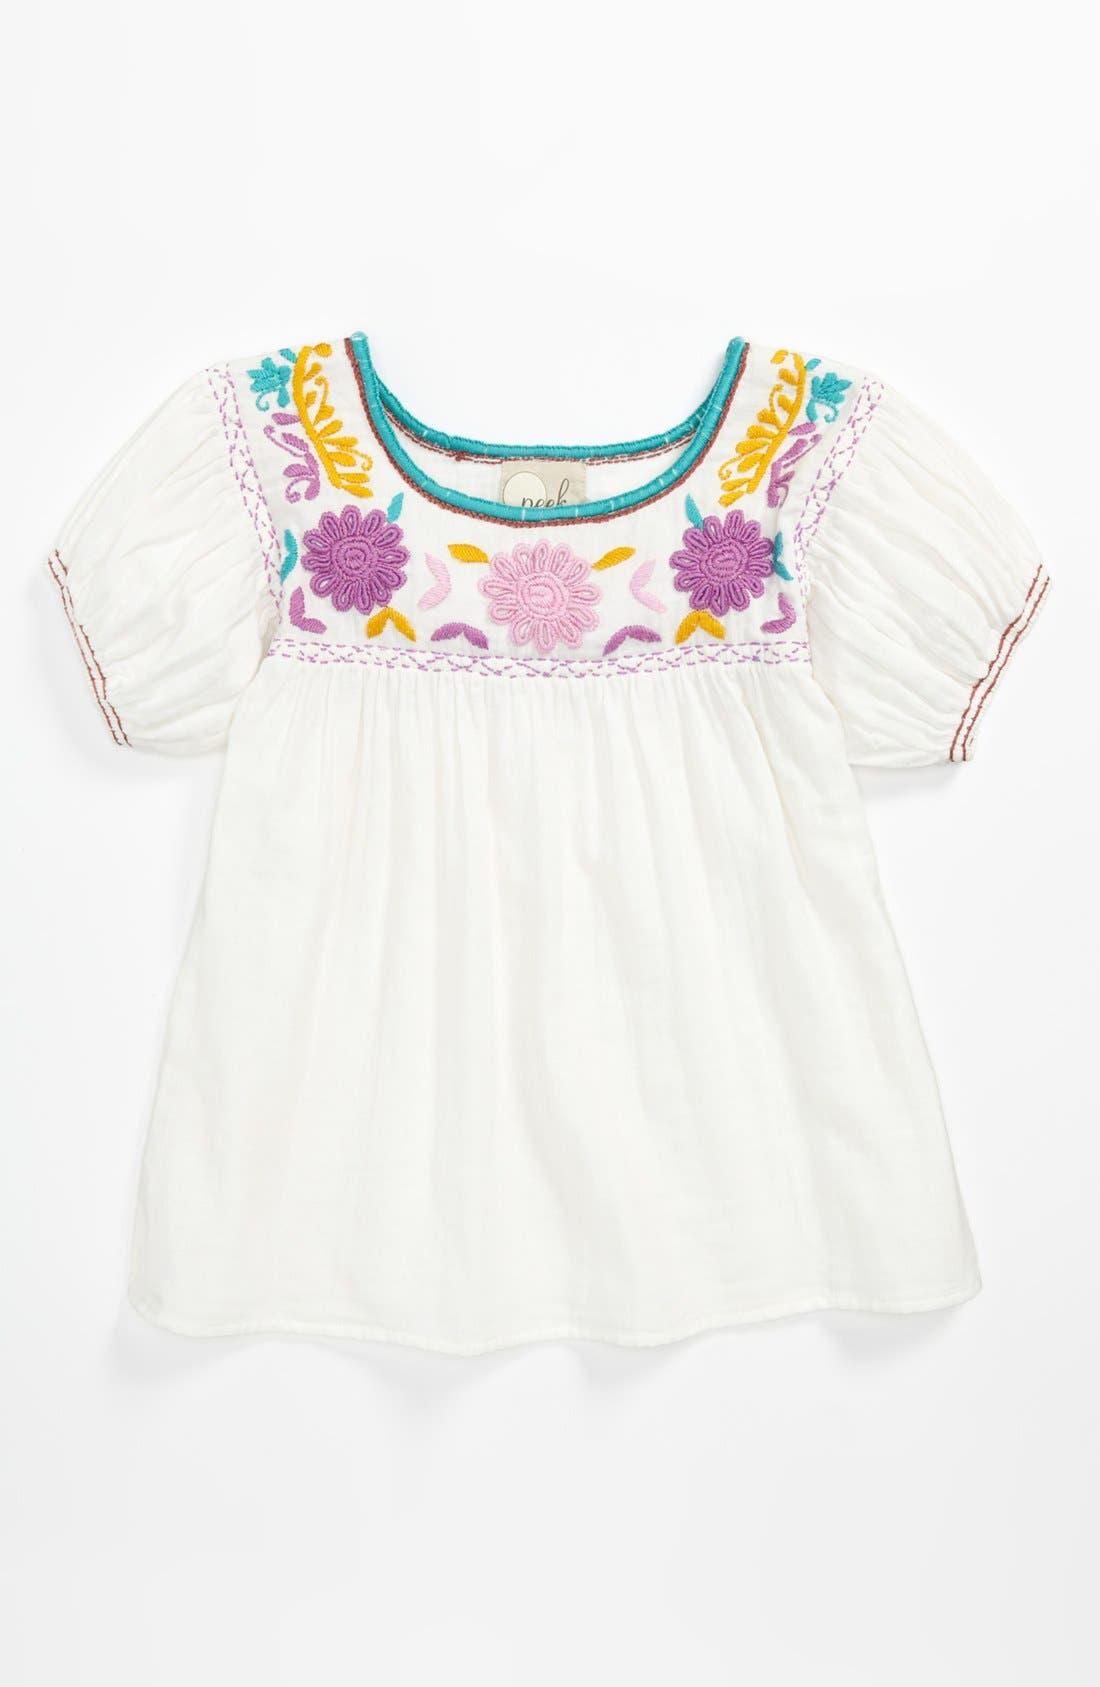 Alternate Image 1 Selected - Peek 'Ashley' Top (Toddler, Little Girls & Big Girls)